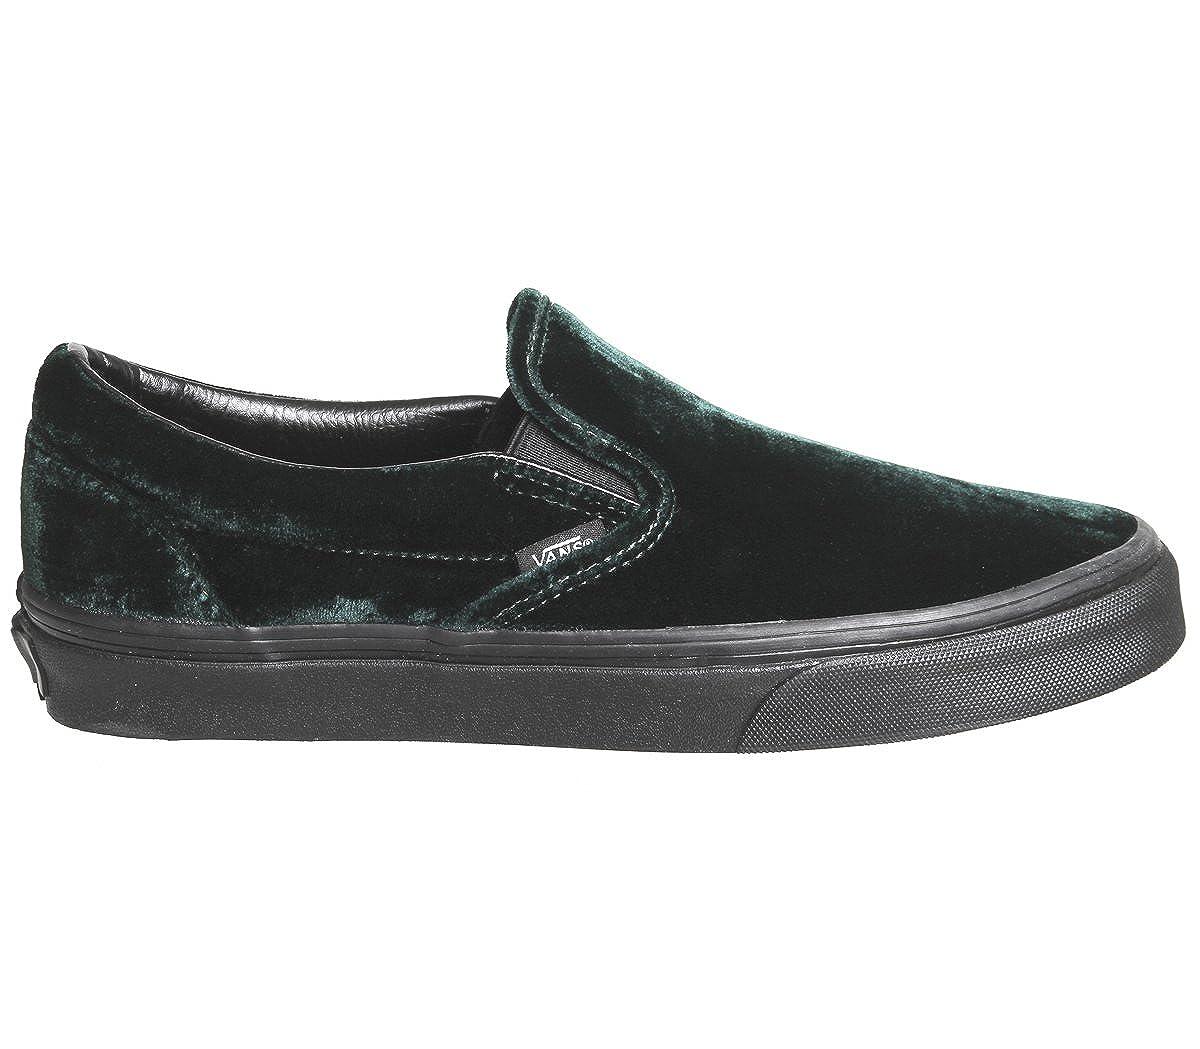 3936ebd807 Vans Men s Classic Slip-on (Velvet) Green Black Sneakers 8.5 Women   7 Men  M US  Buy Online at Low Prices in India - Amazon.in